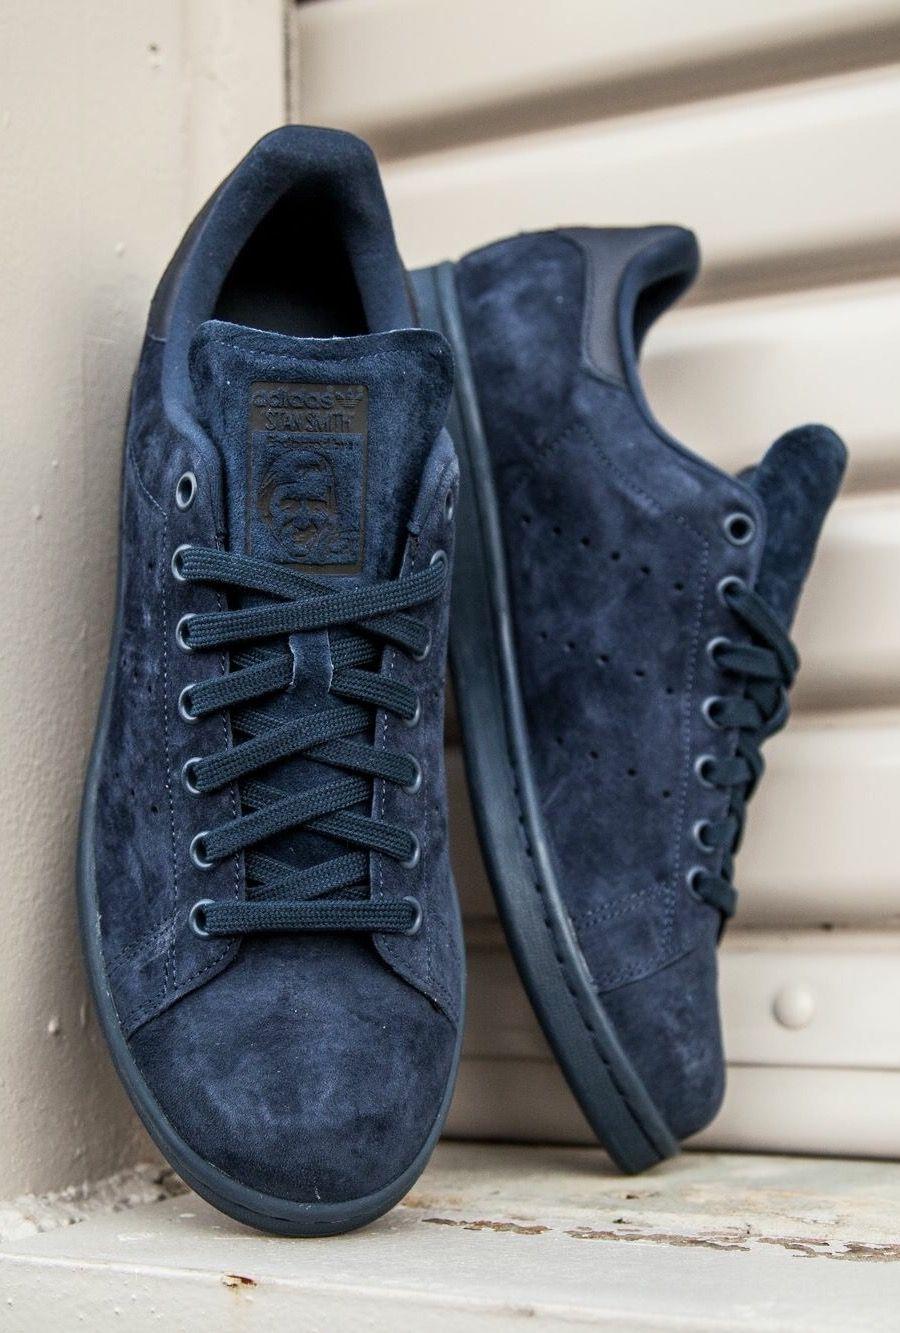 competitive price b6afa c4741 adidas Stan Smith  Midnight Αθλητικά Παπούτσια Adidas, Παπούτσια Nike, Μαύρο,  Καλά Παπούτσια